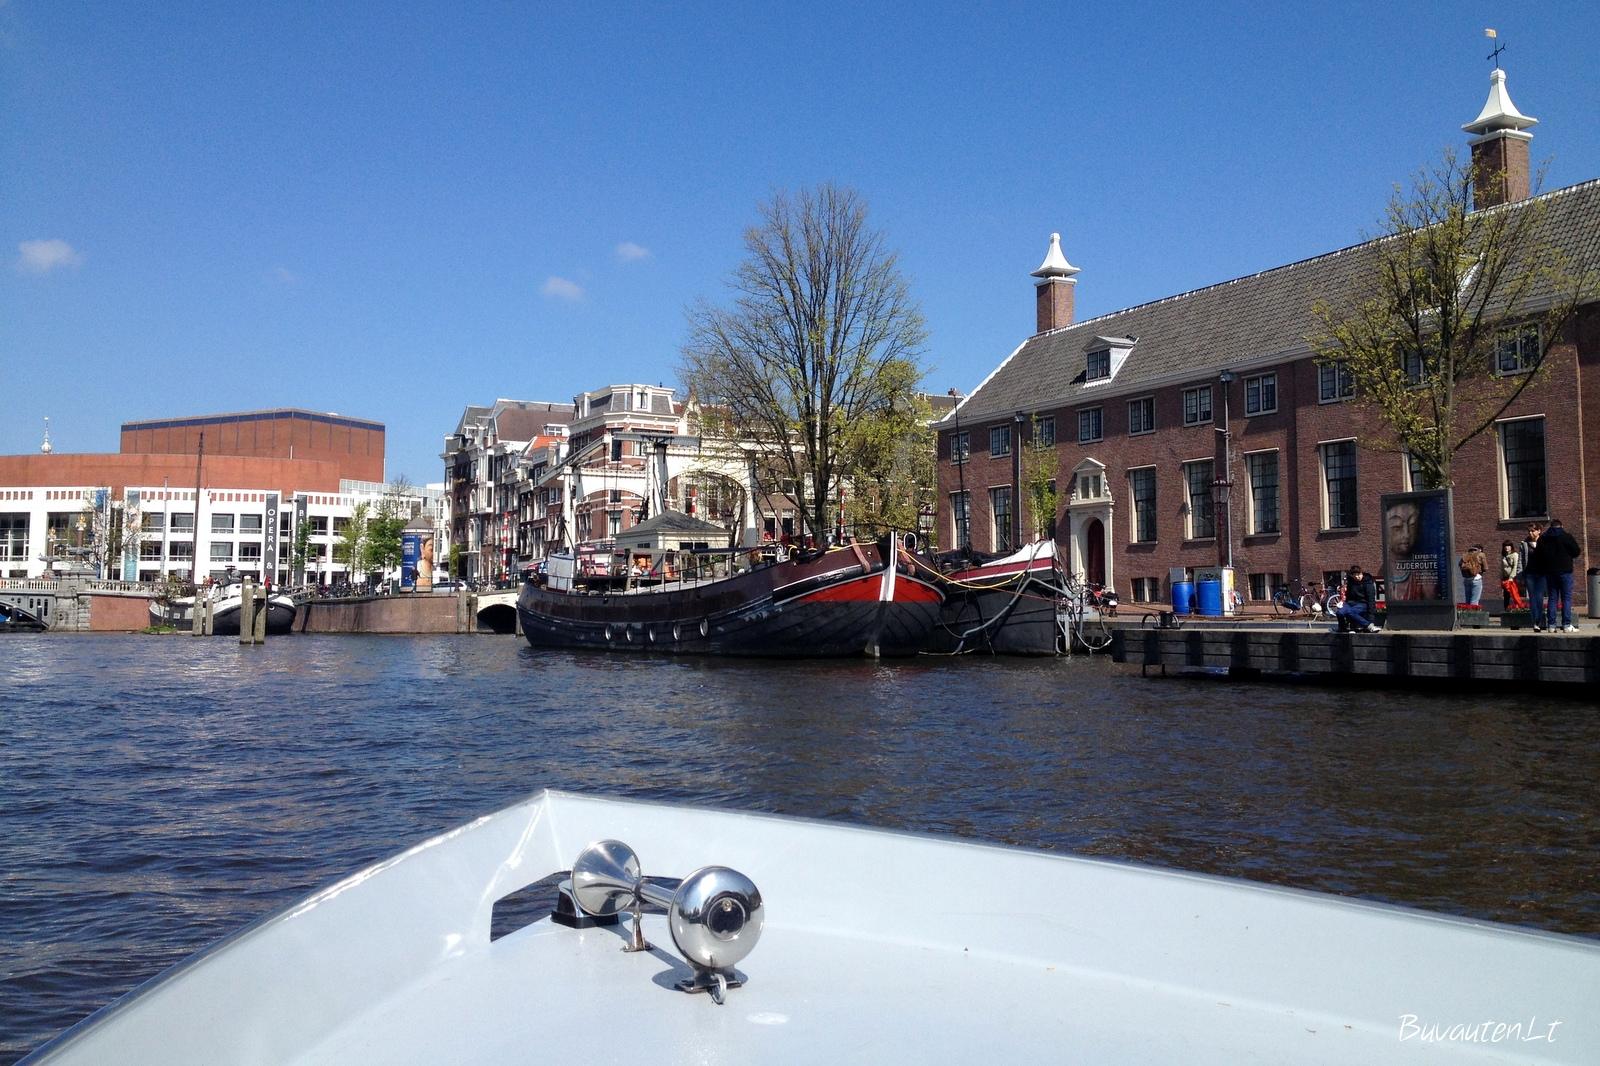 Amsterdamas - miestas ant vandens